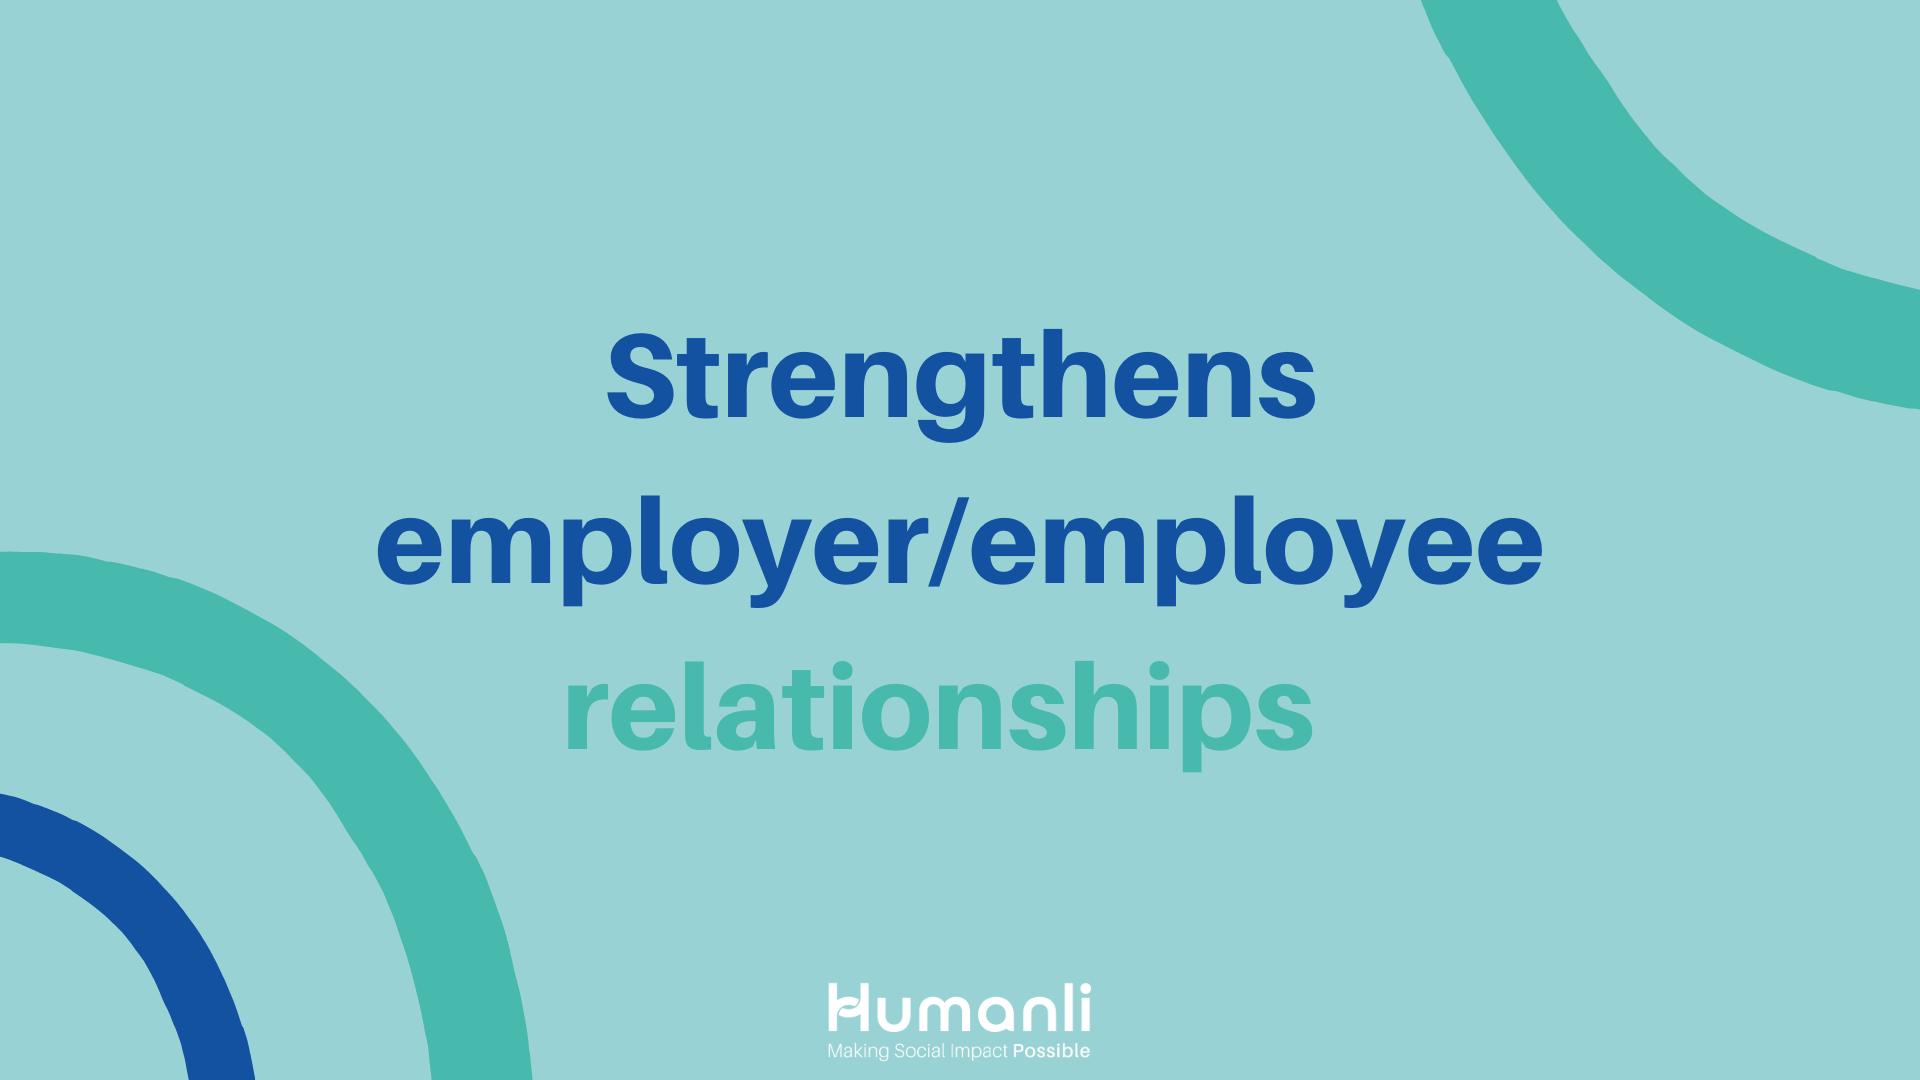 Strengthens employer / employee relationships